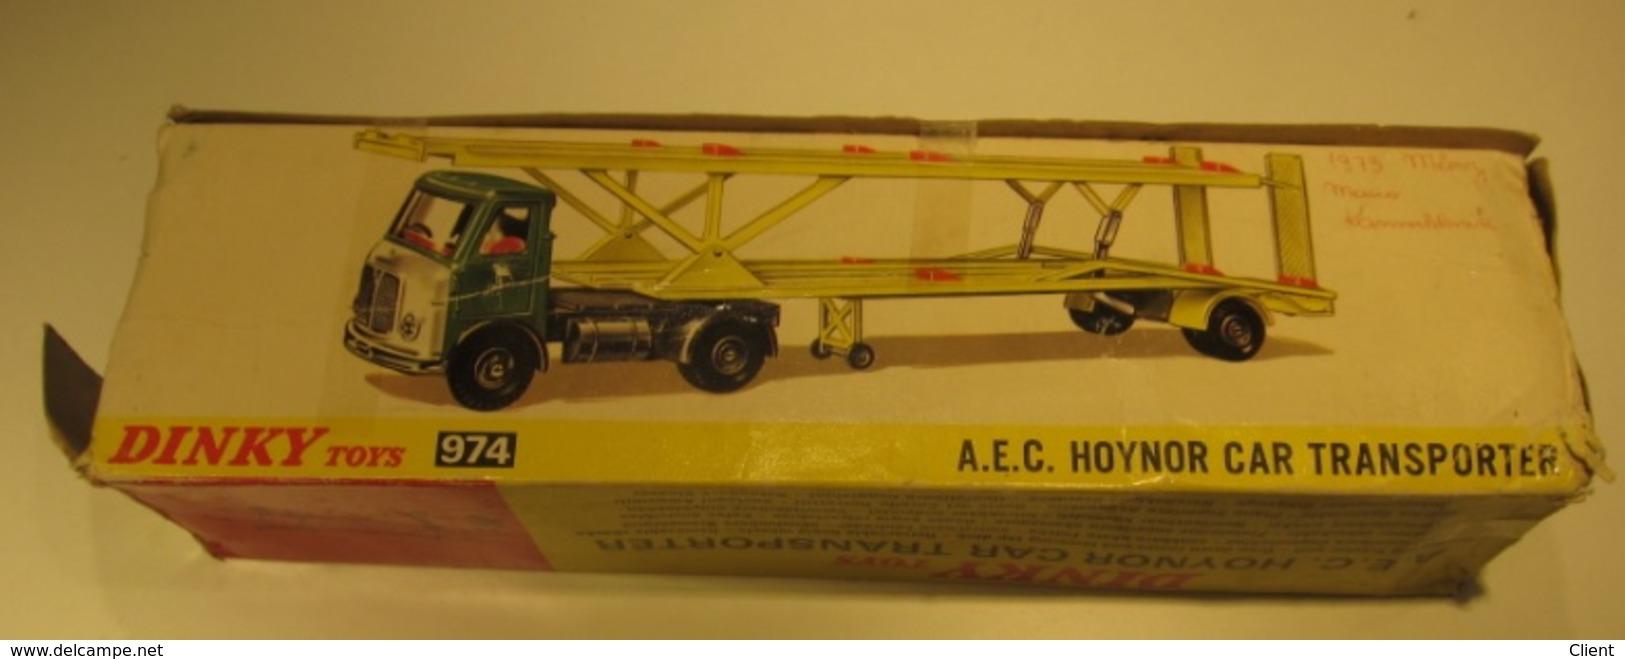 DINKY TOYS 974 - A.E.C HOYNOR CAR TRANSPORTER - - Voitures, Camions, Bus